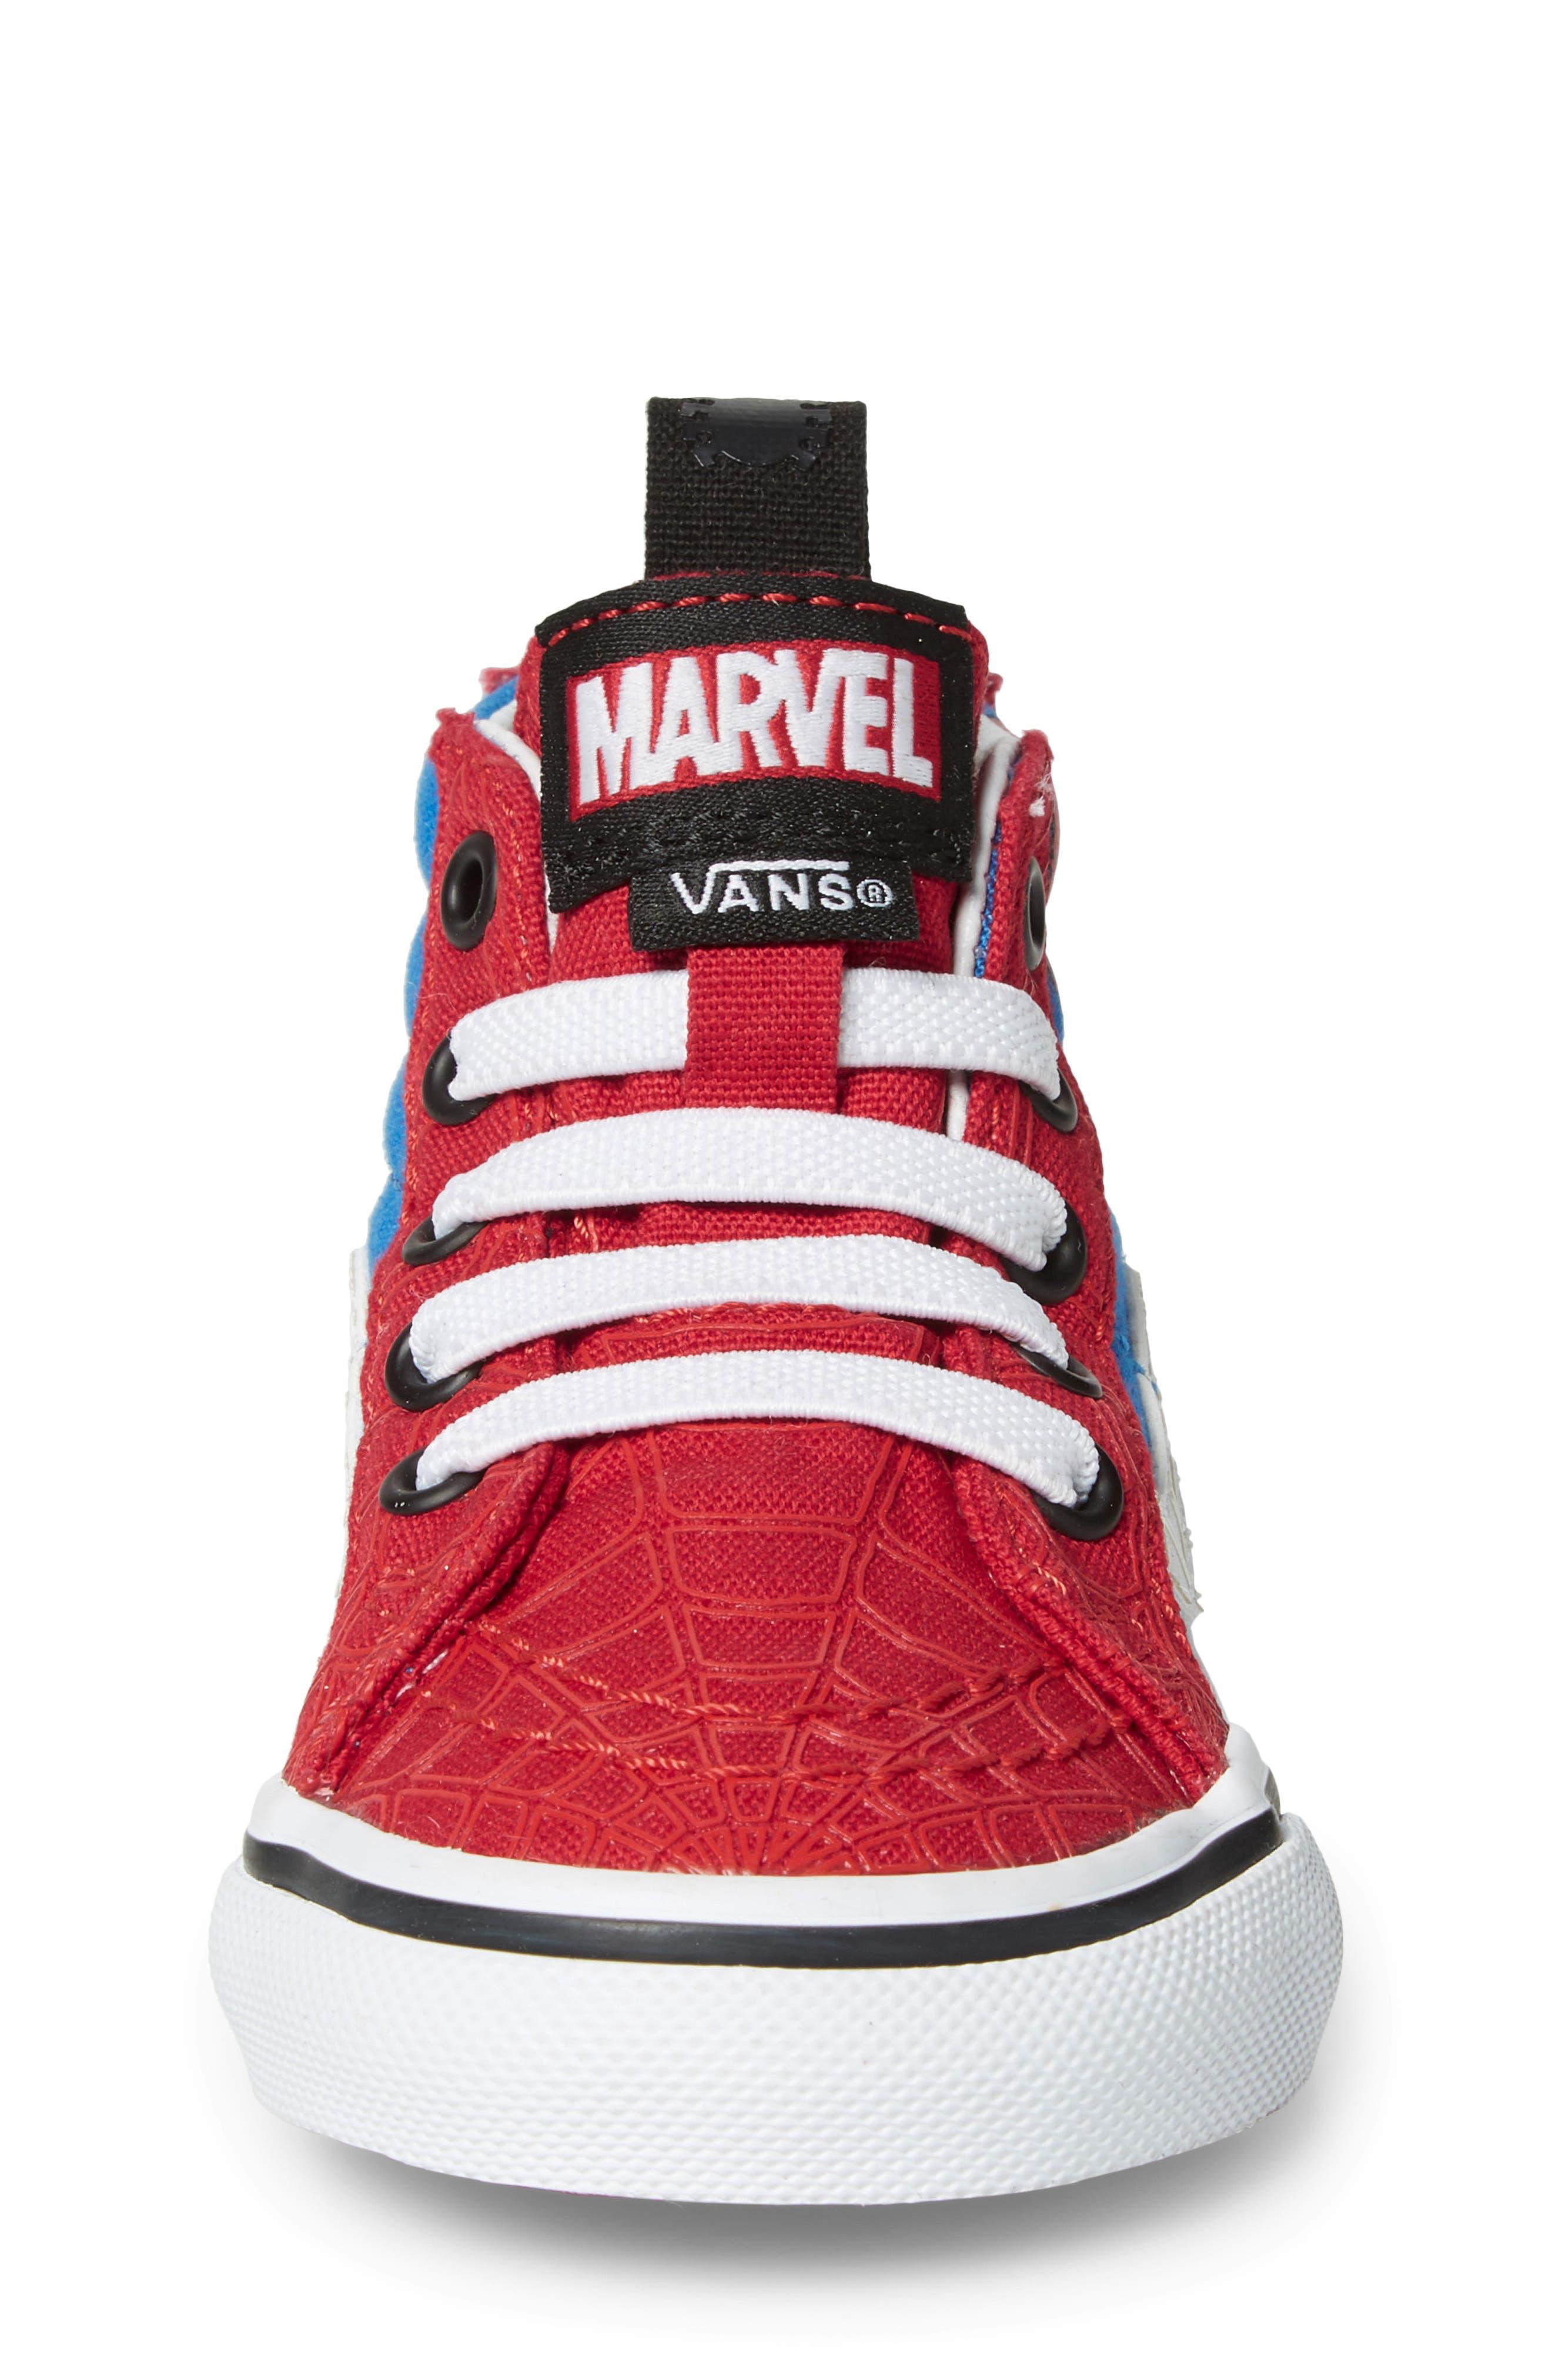 x Marvel<sup>®</sup> Spider-Man SK8-Hi Sneaker,                             Alternate thumbnail 4, color,                             610